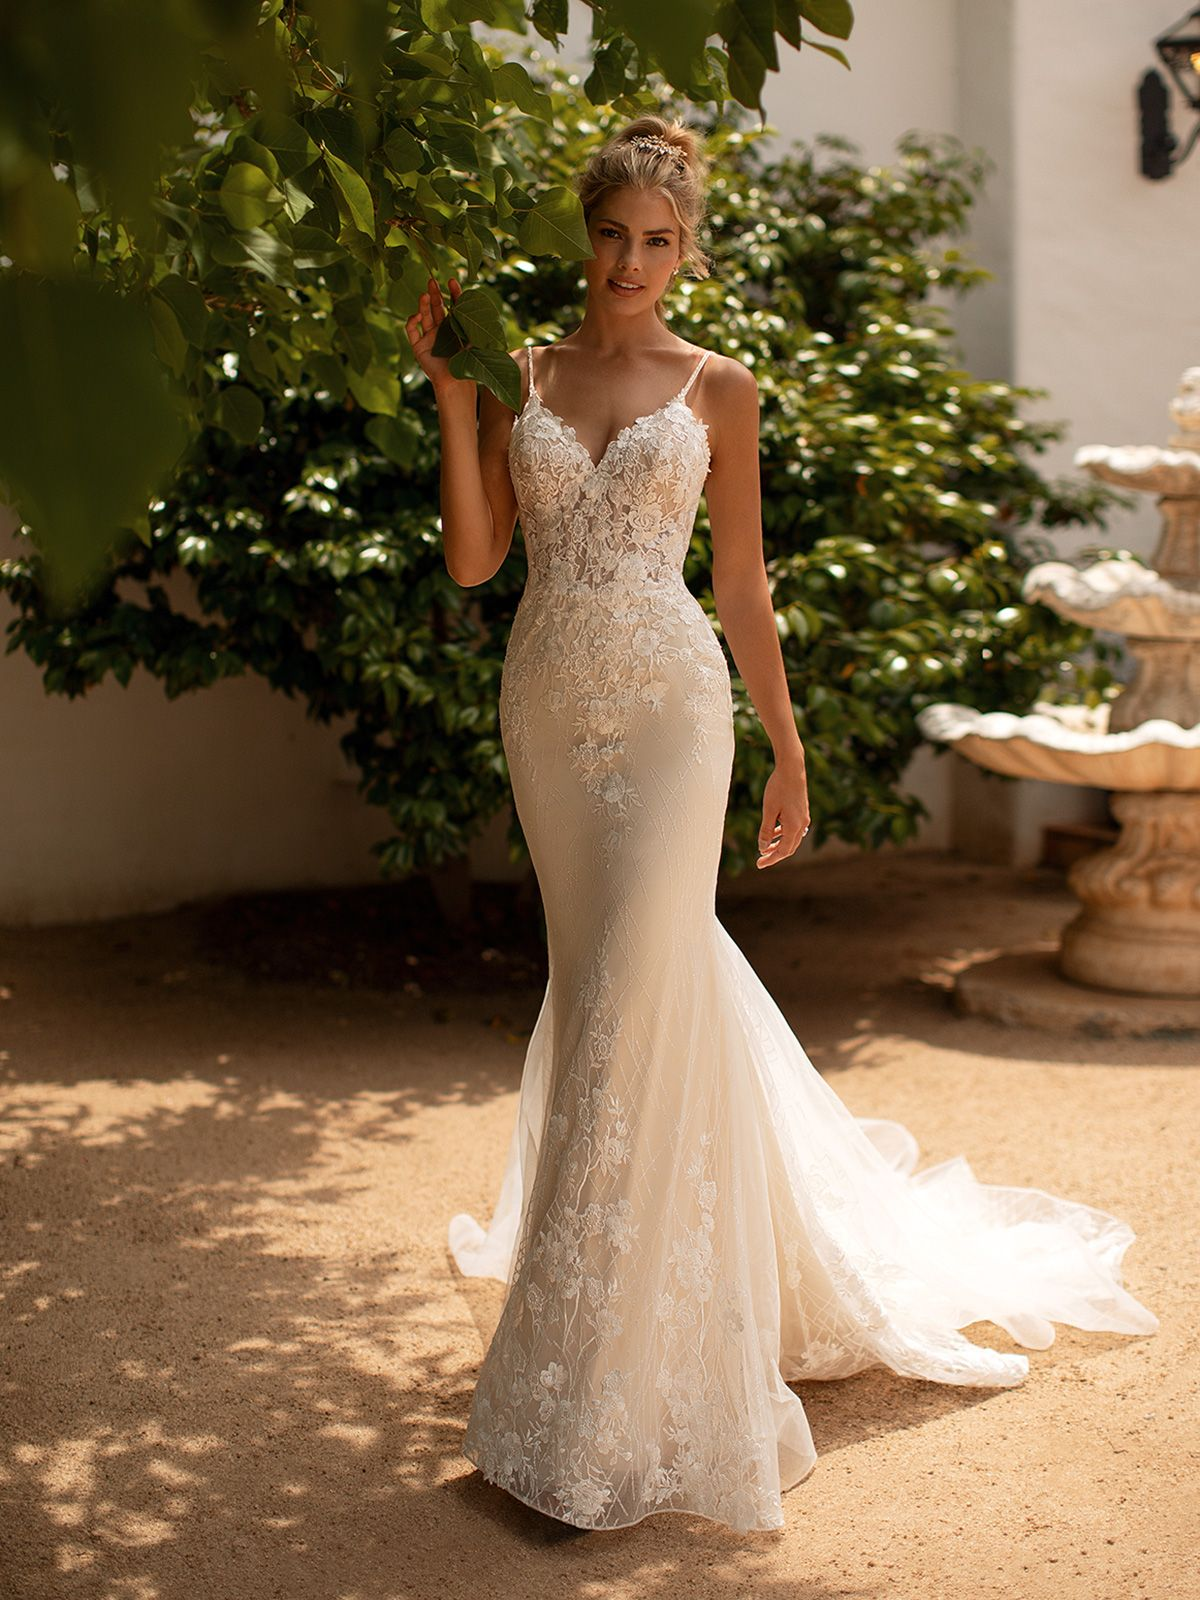 Checkered sparkle mermaid wedding dress moonlight